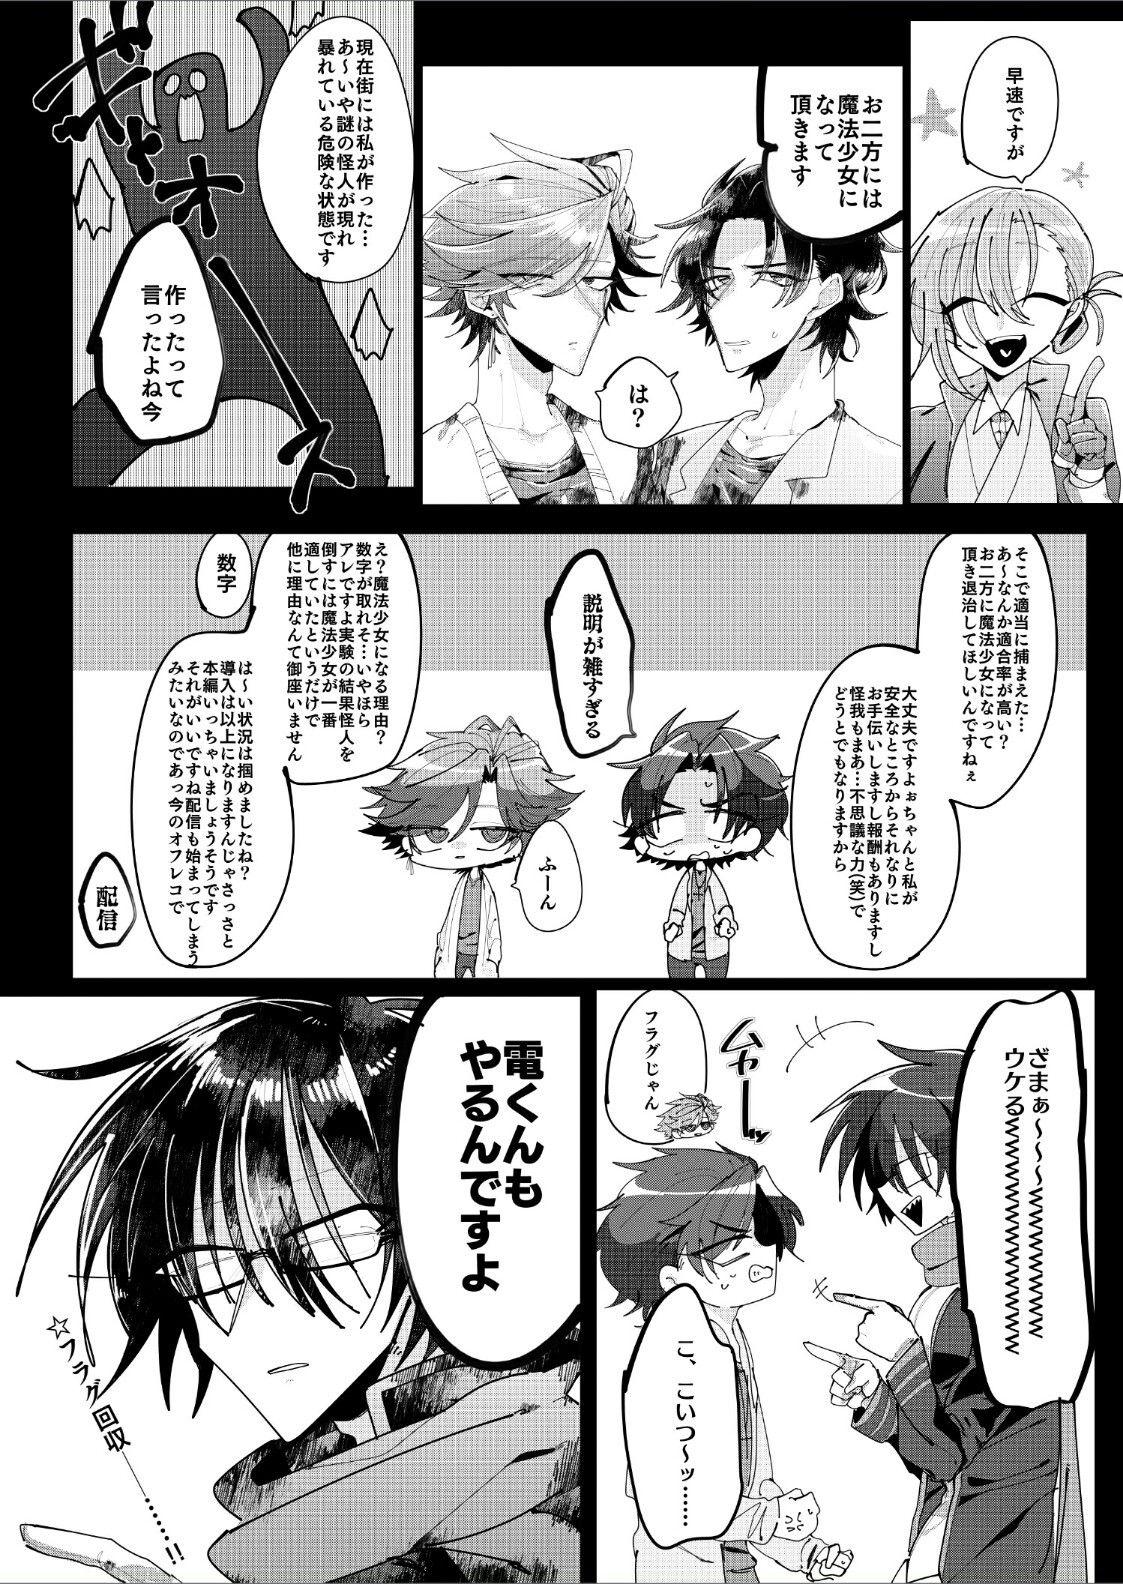 【拍手喝罪 同人】ふた妹×兄~魔法少女編~